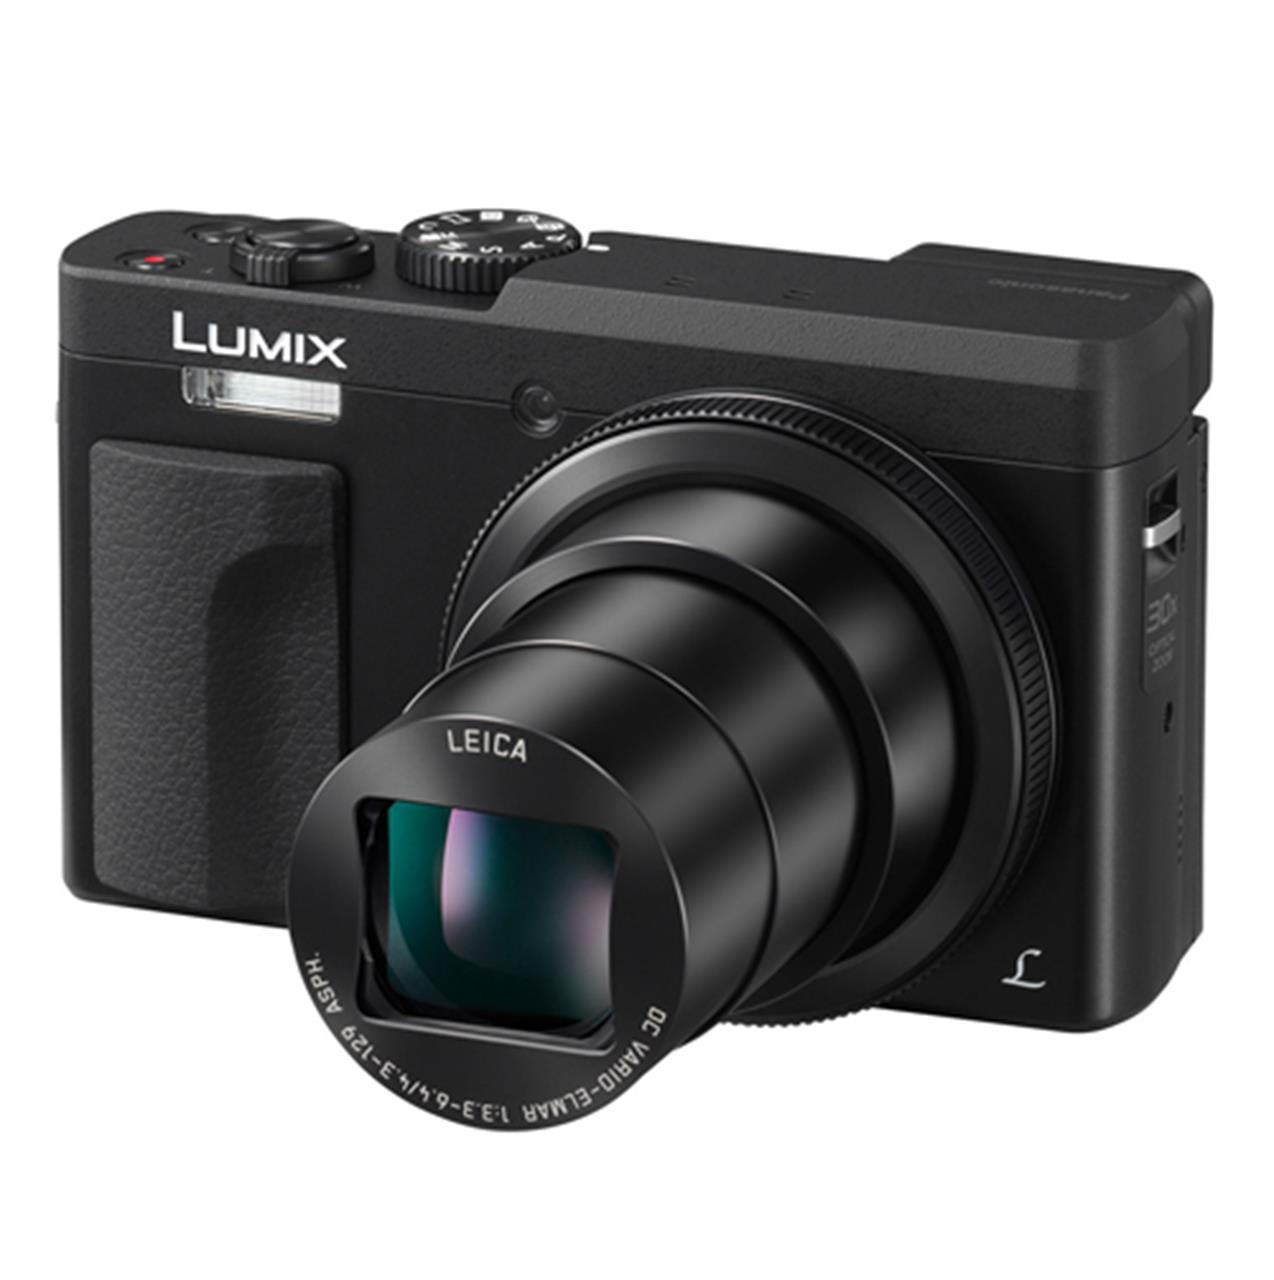 5025232867769__lumix_dmc_tz90_zwart_compact_camera_van_panasonic.jpg